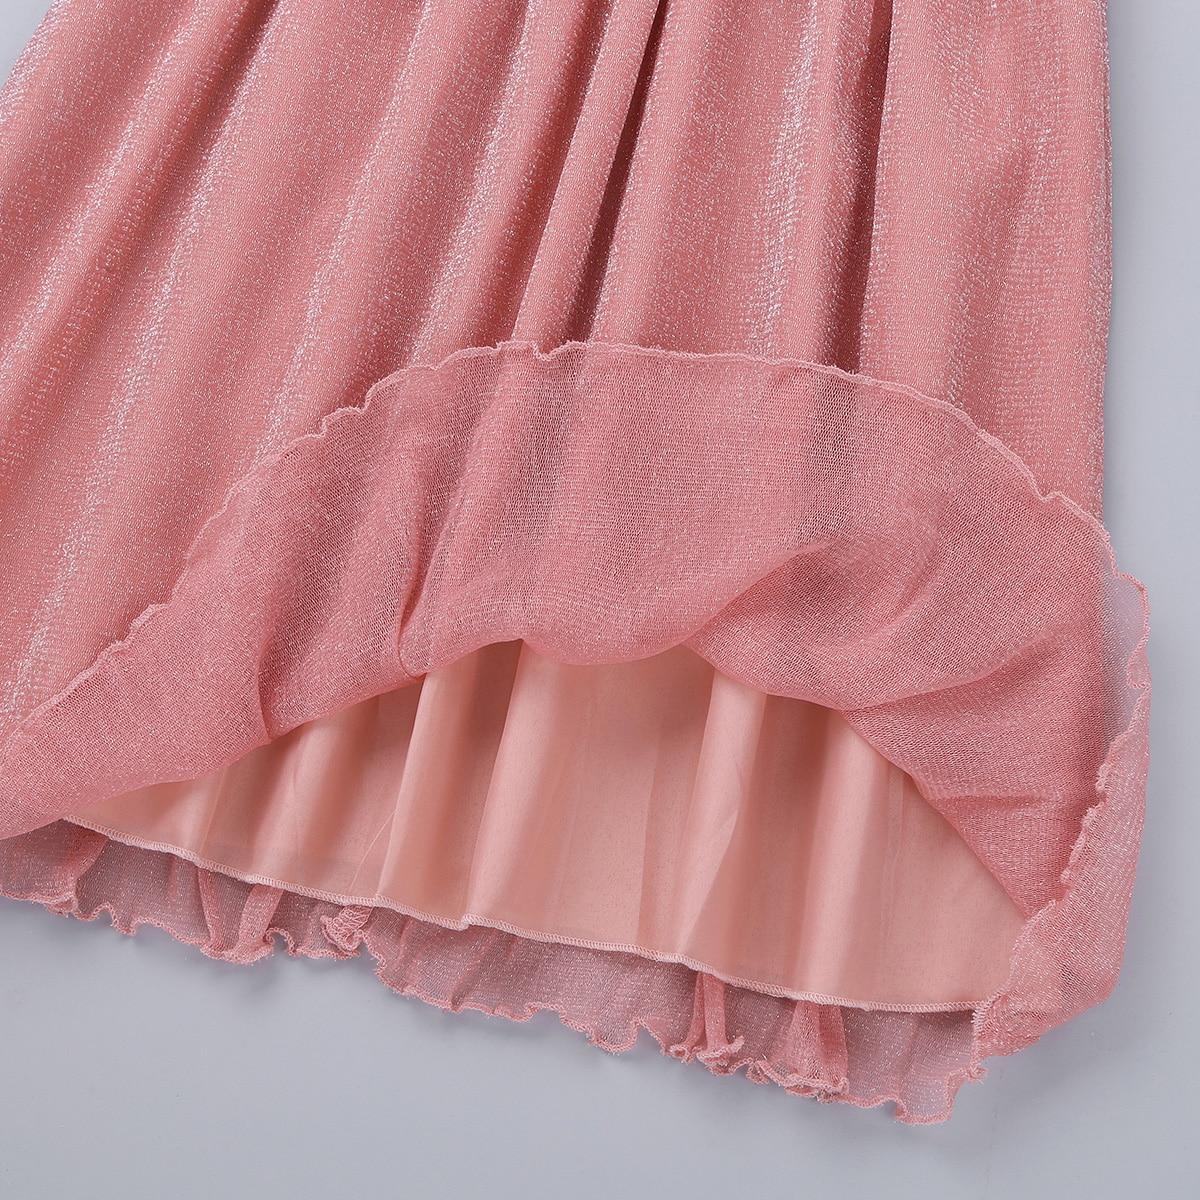 iiniim Teen Girls Sleeveless Sequined Floral Lace Shiny Dress Vestido de festa for Weeding Formal Birthday Party Summer Dresses 5